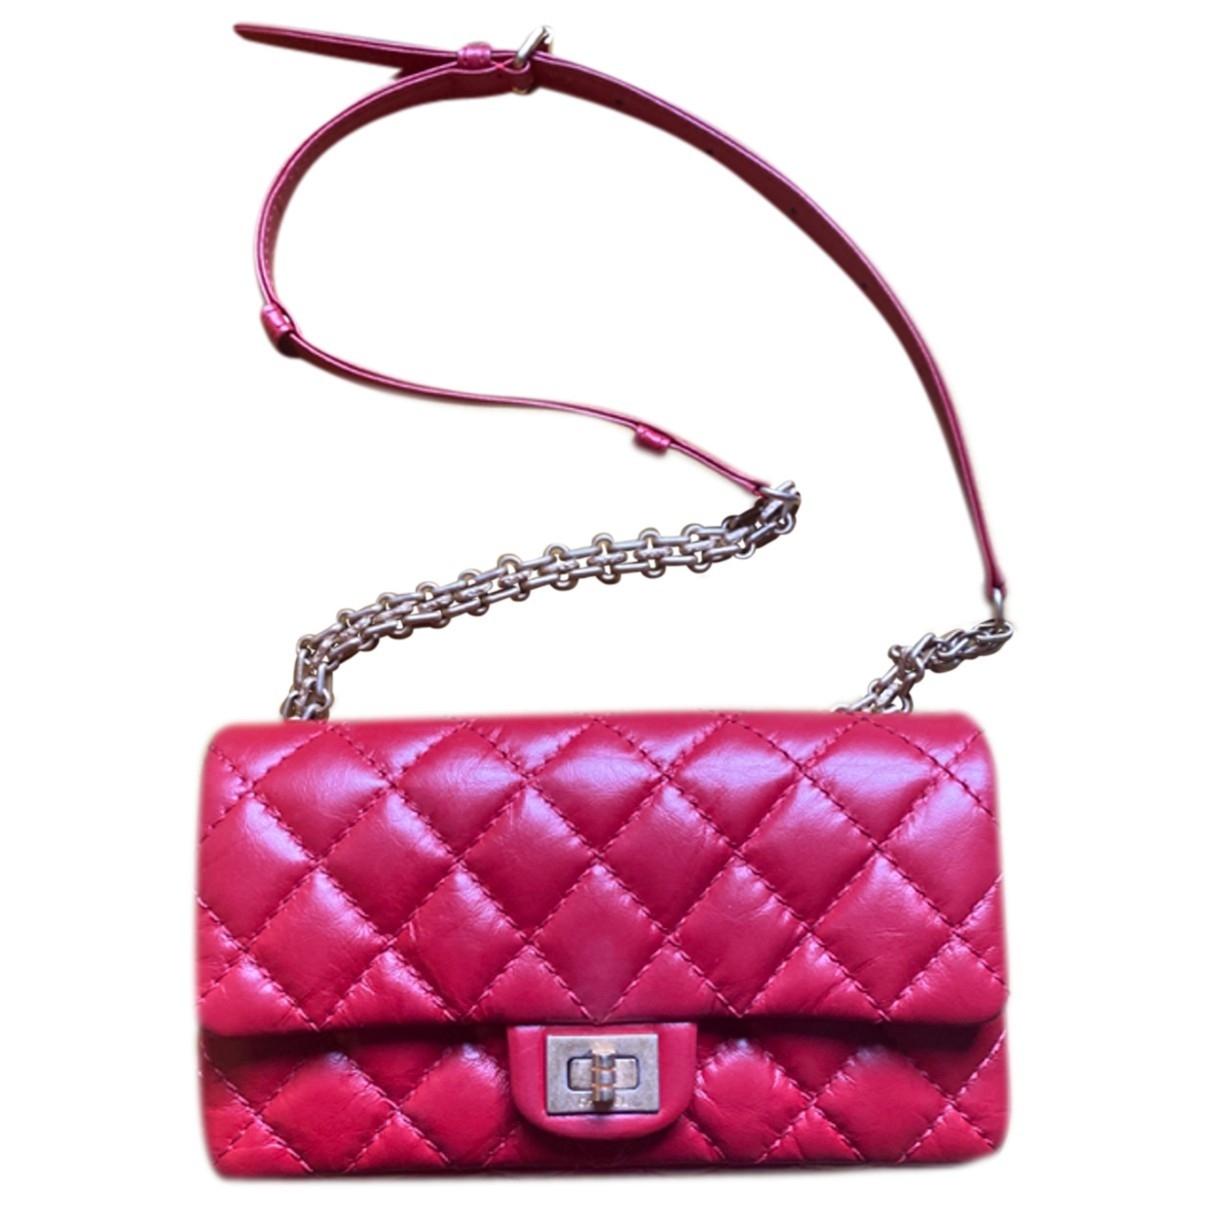 Chanel 2.55 Red Leather handbag for Women \N